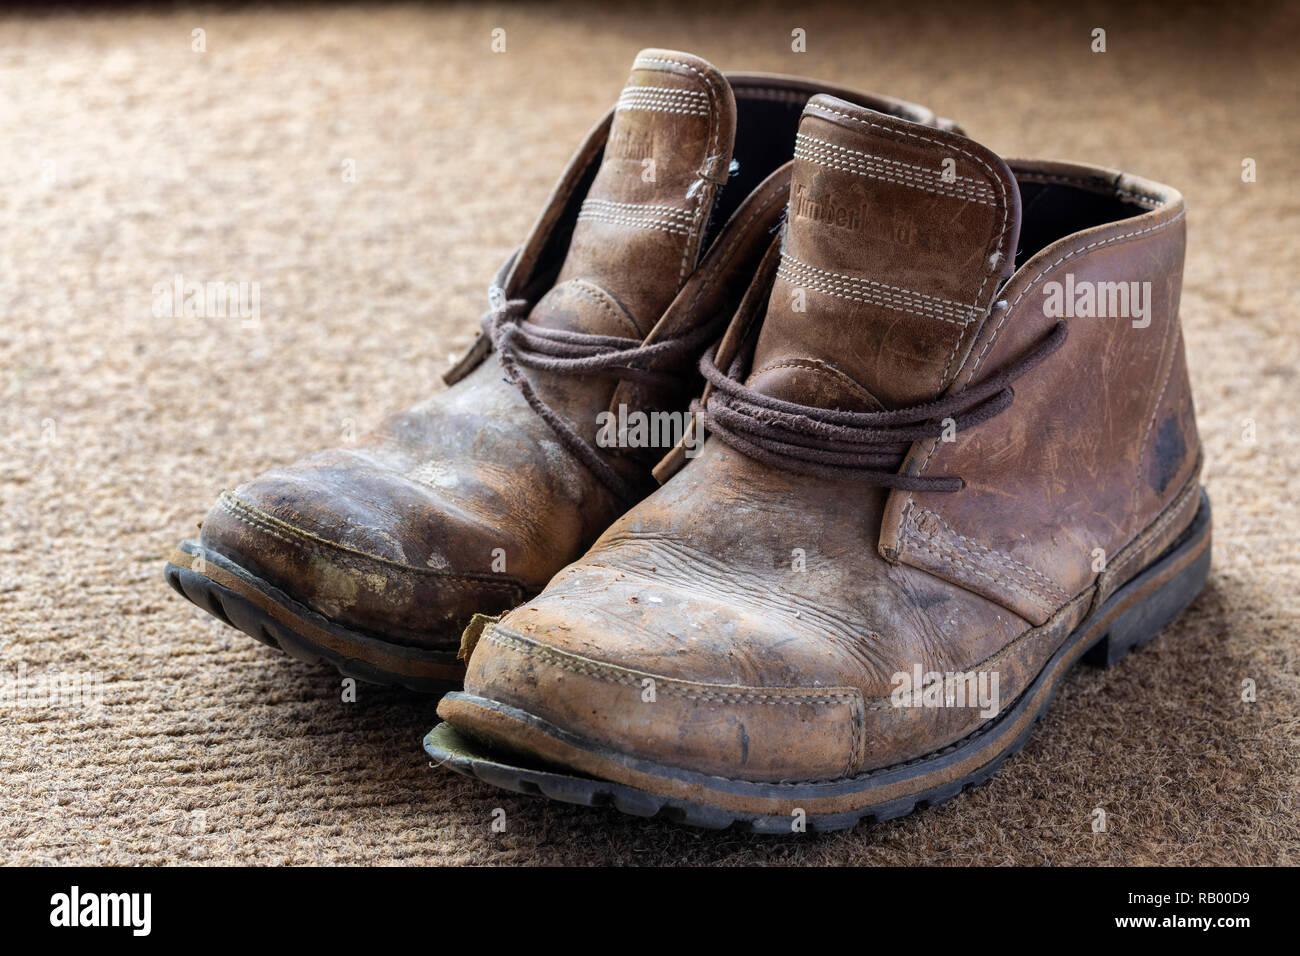 0da24c5d31f Worn Leather Boots Stock Photos & Worn Leather Boots Stock Images ...